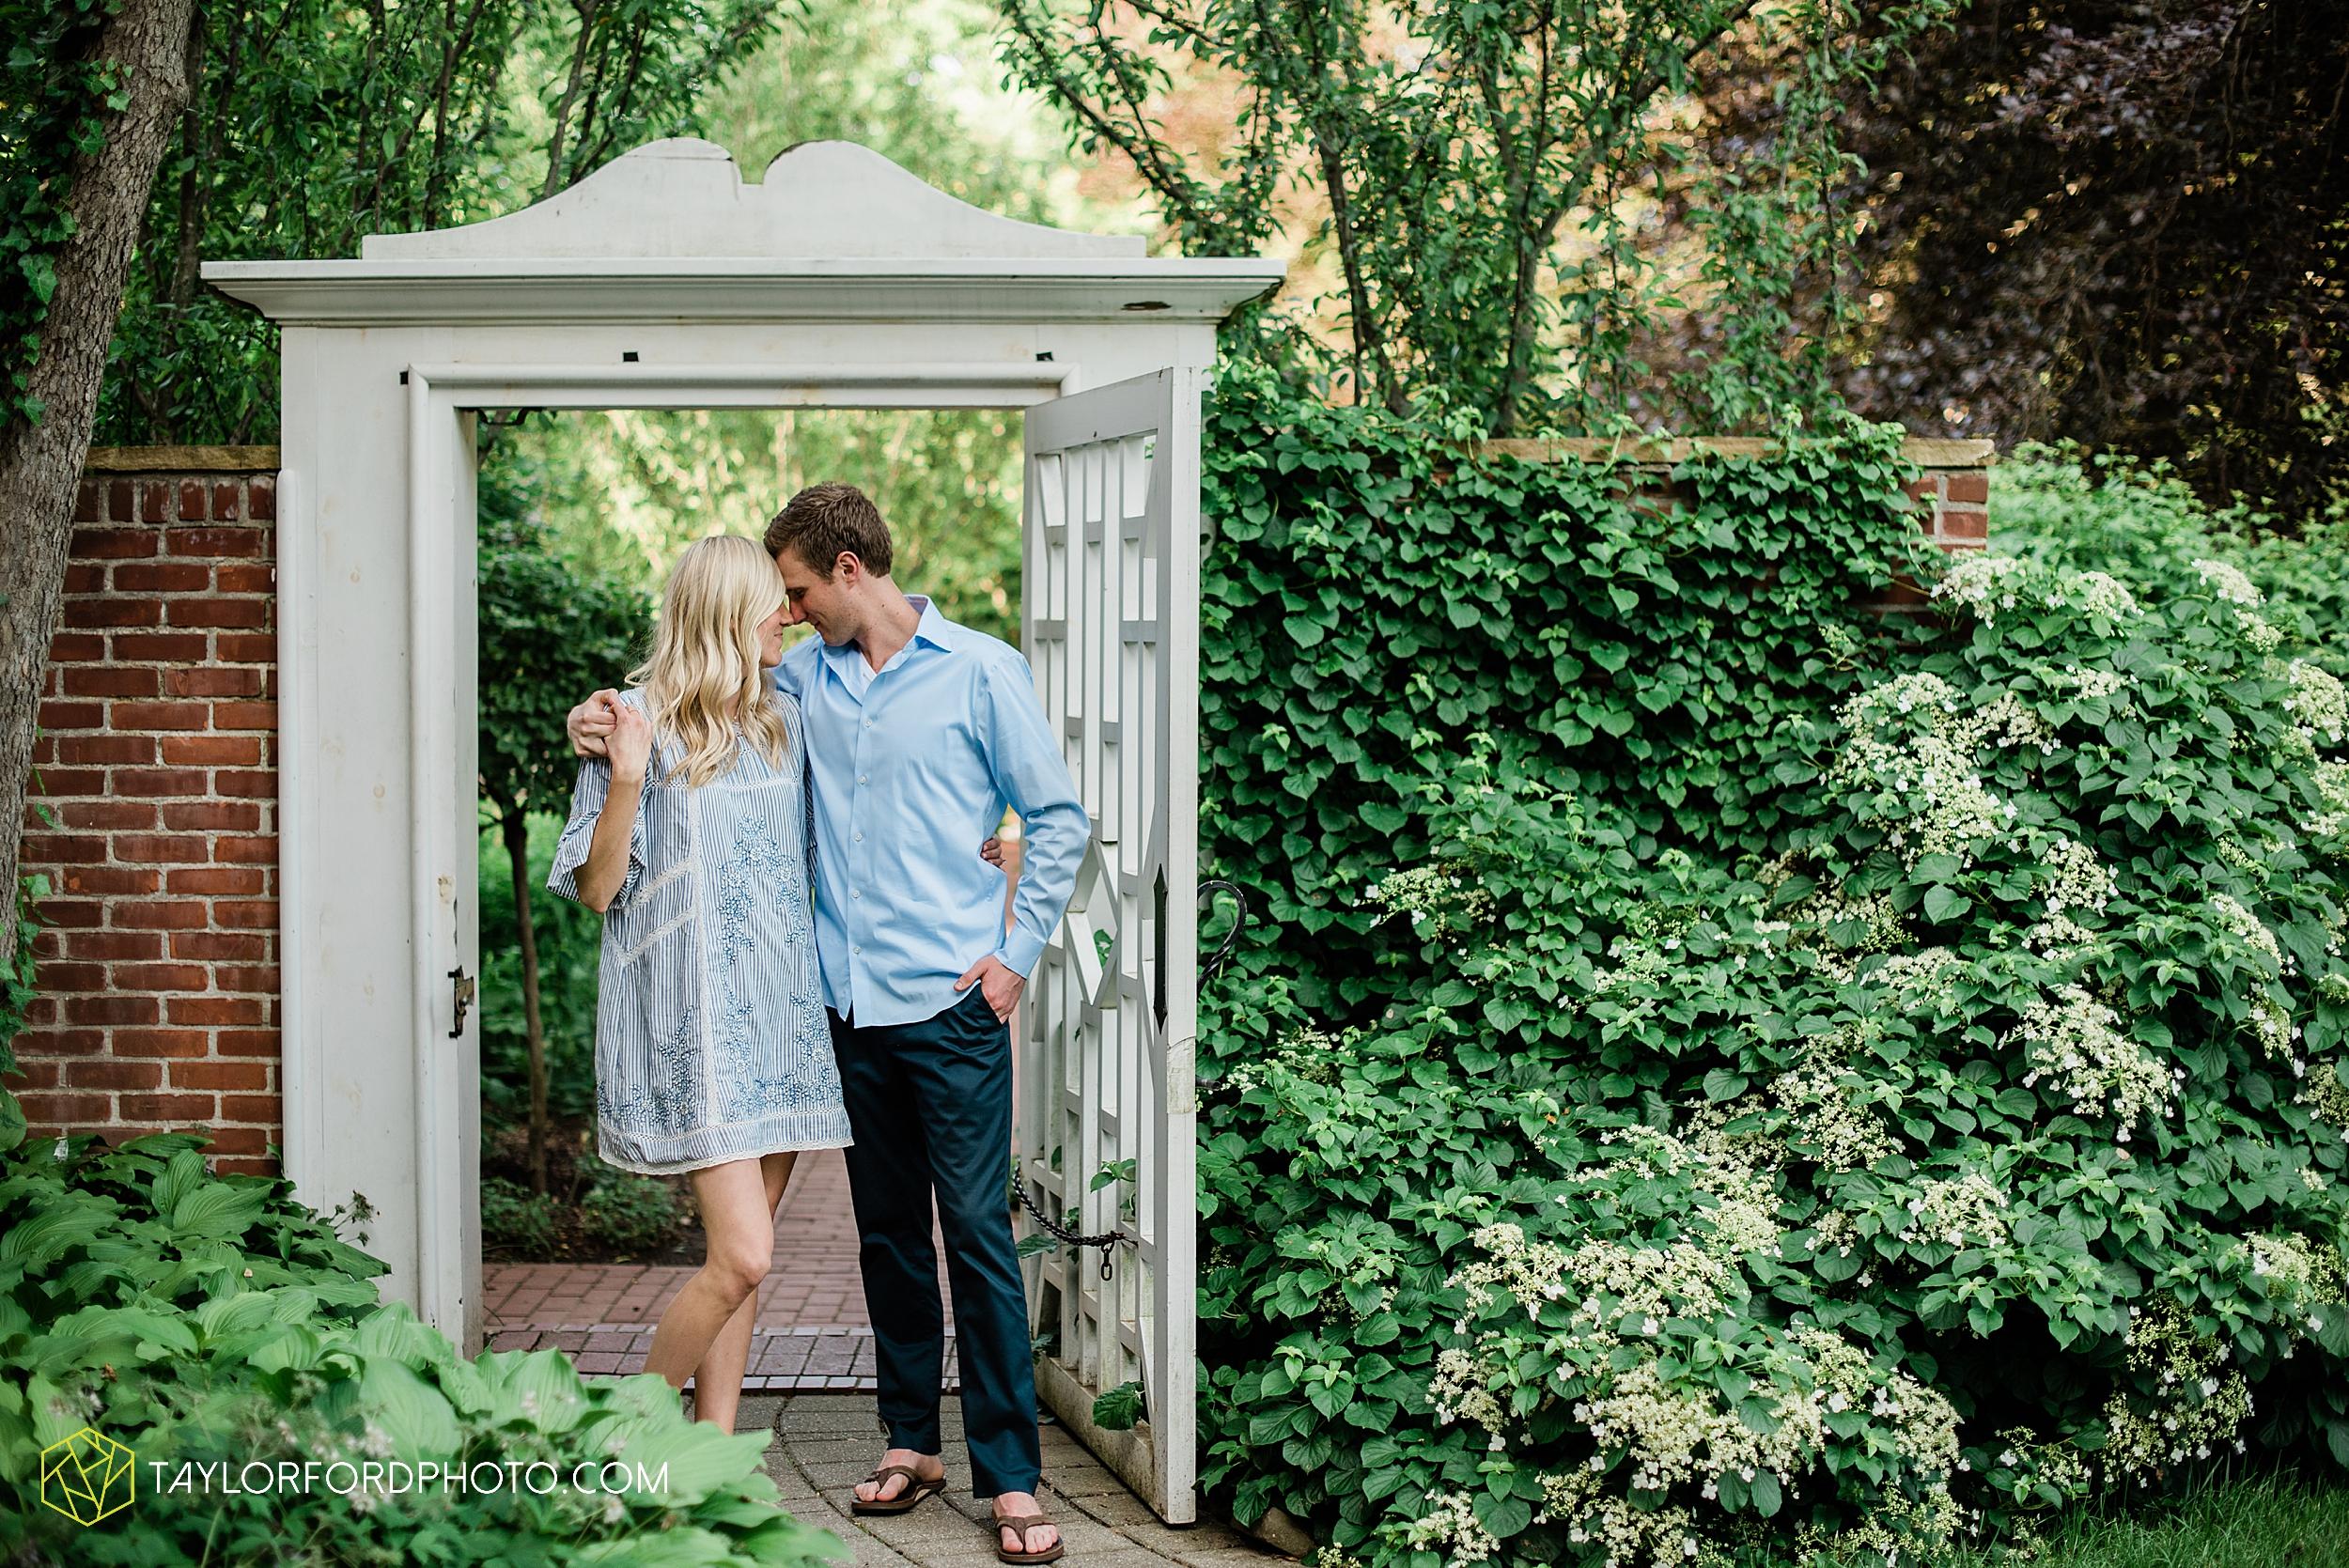 toledo-ohio-wildwood-preserve-metropark-manor-house-engagement-photographer-photography-taylor-ford-hirschy-photographer_3128.jpg